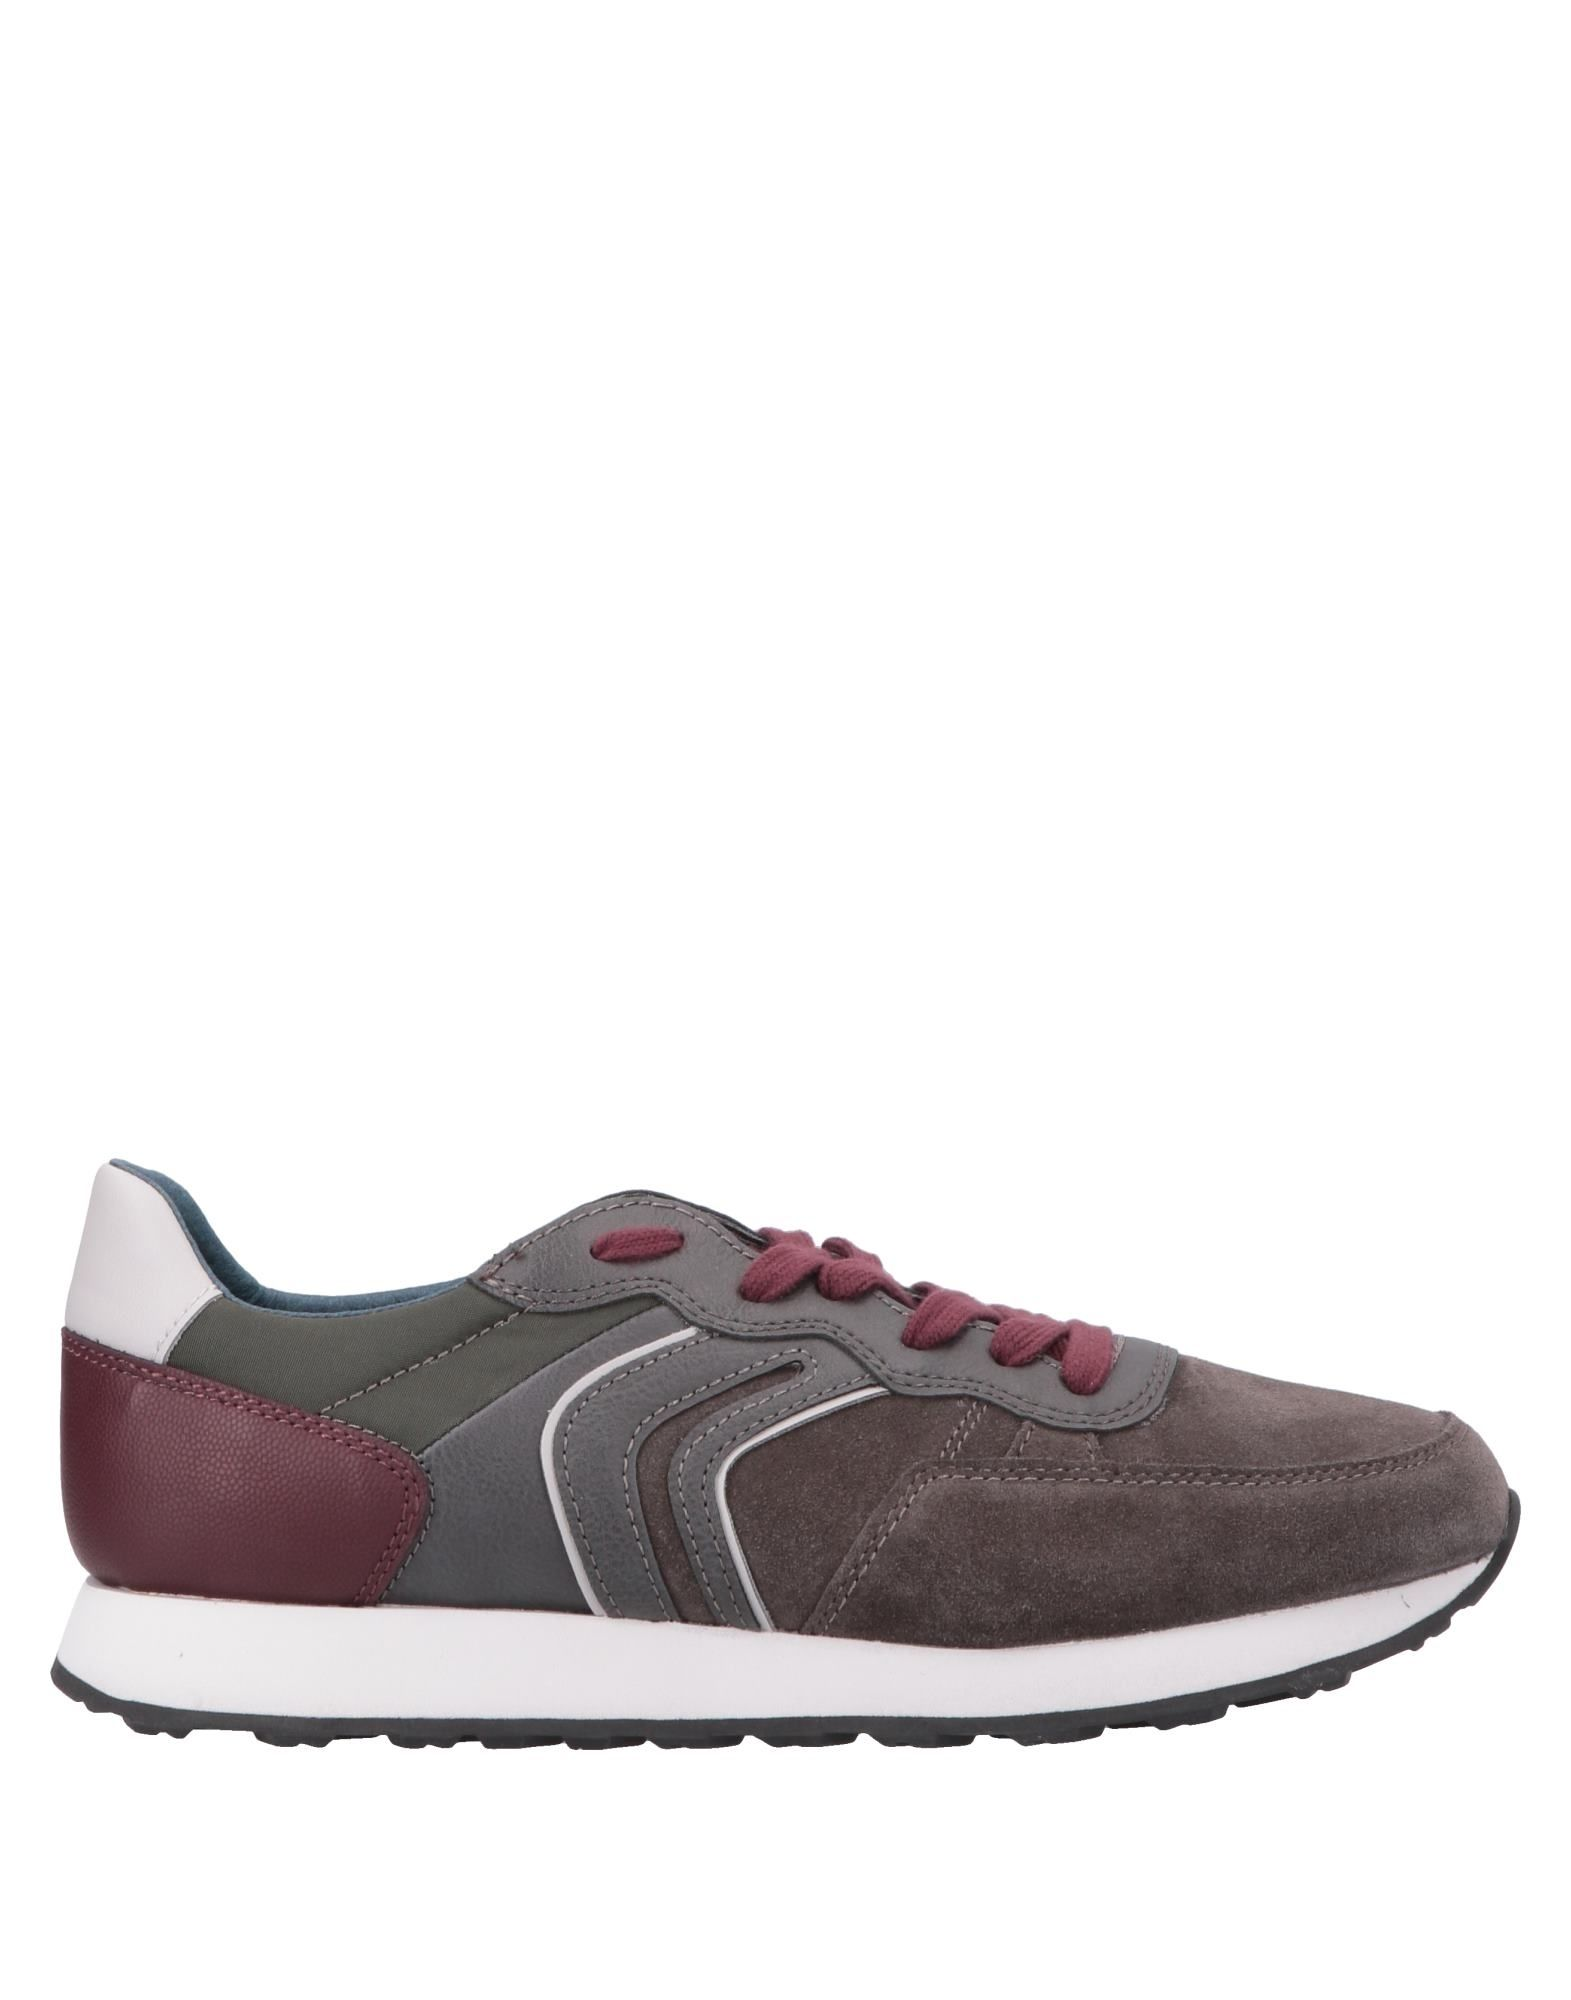 Rabatt echte Schuhe Geox Turnschuhes Herren 11587365OS